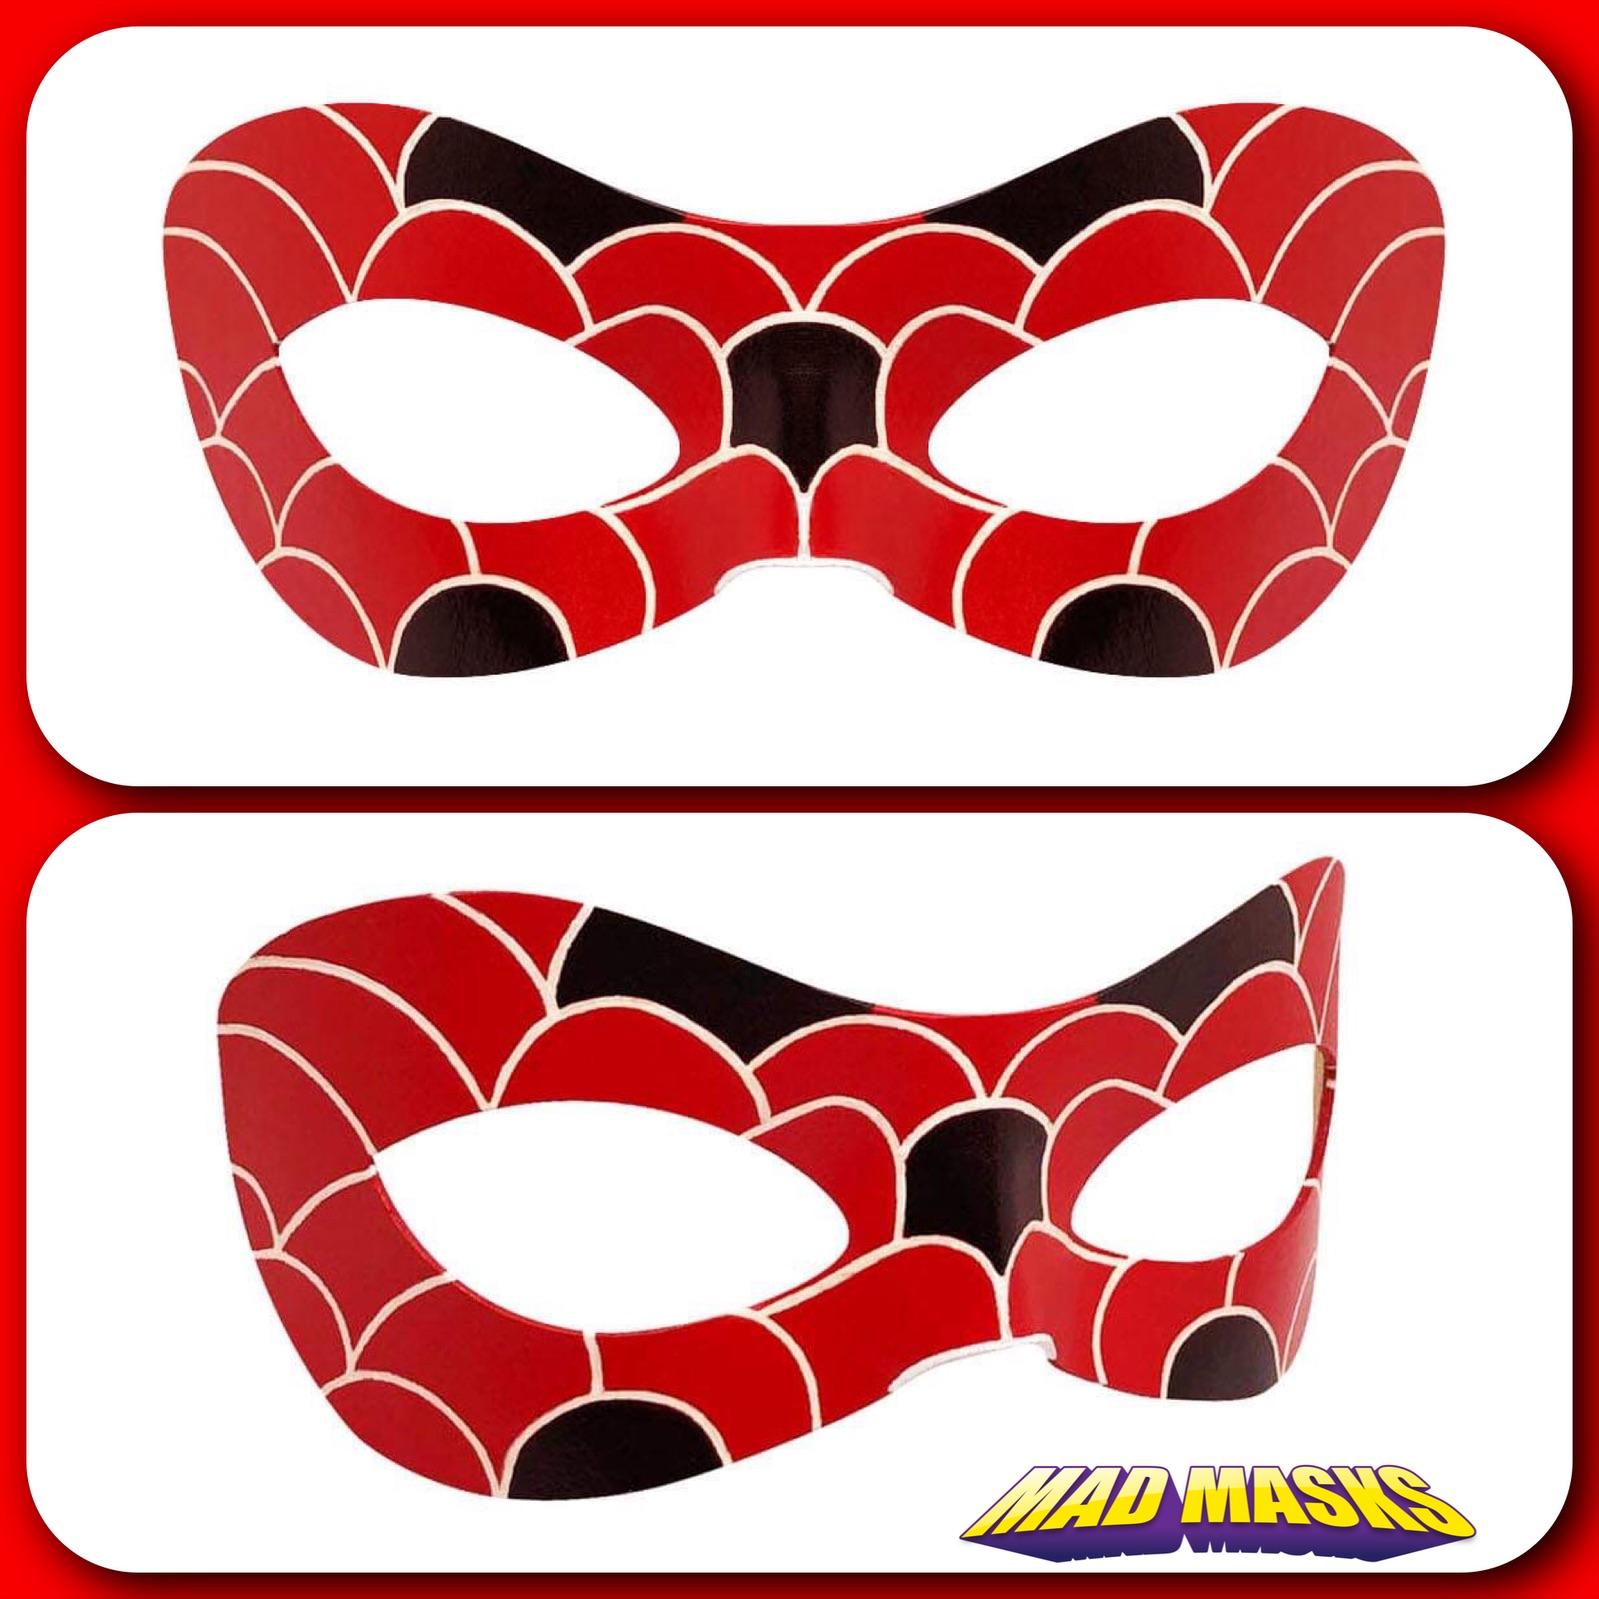 aqua-ladybug-mask-mad-masks.jpg